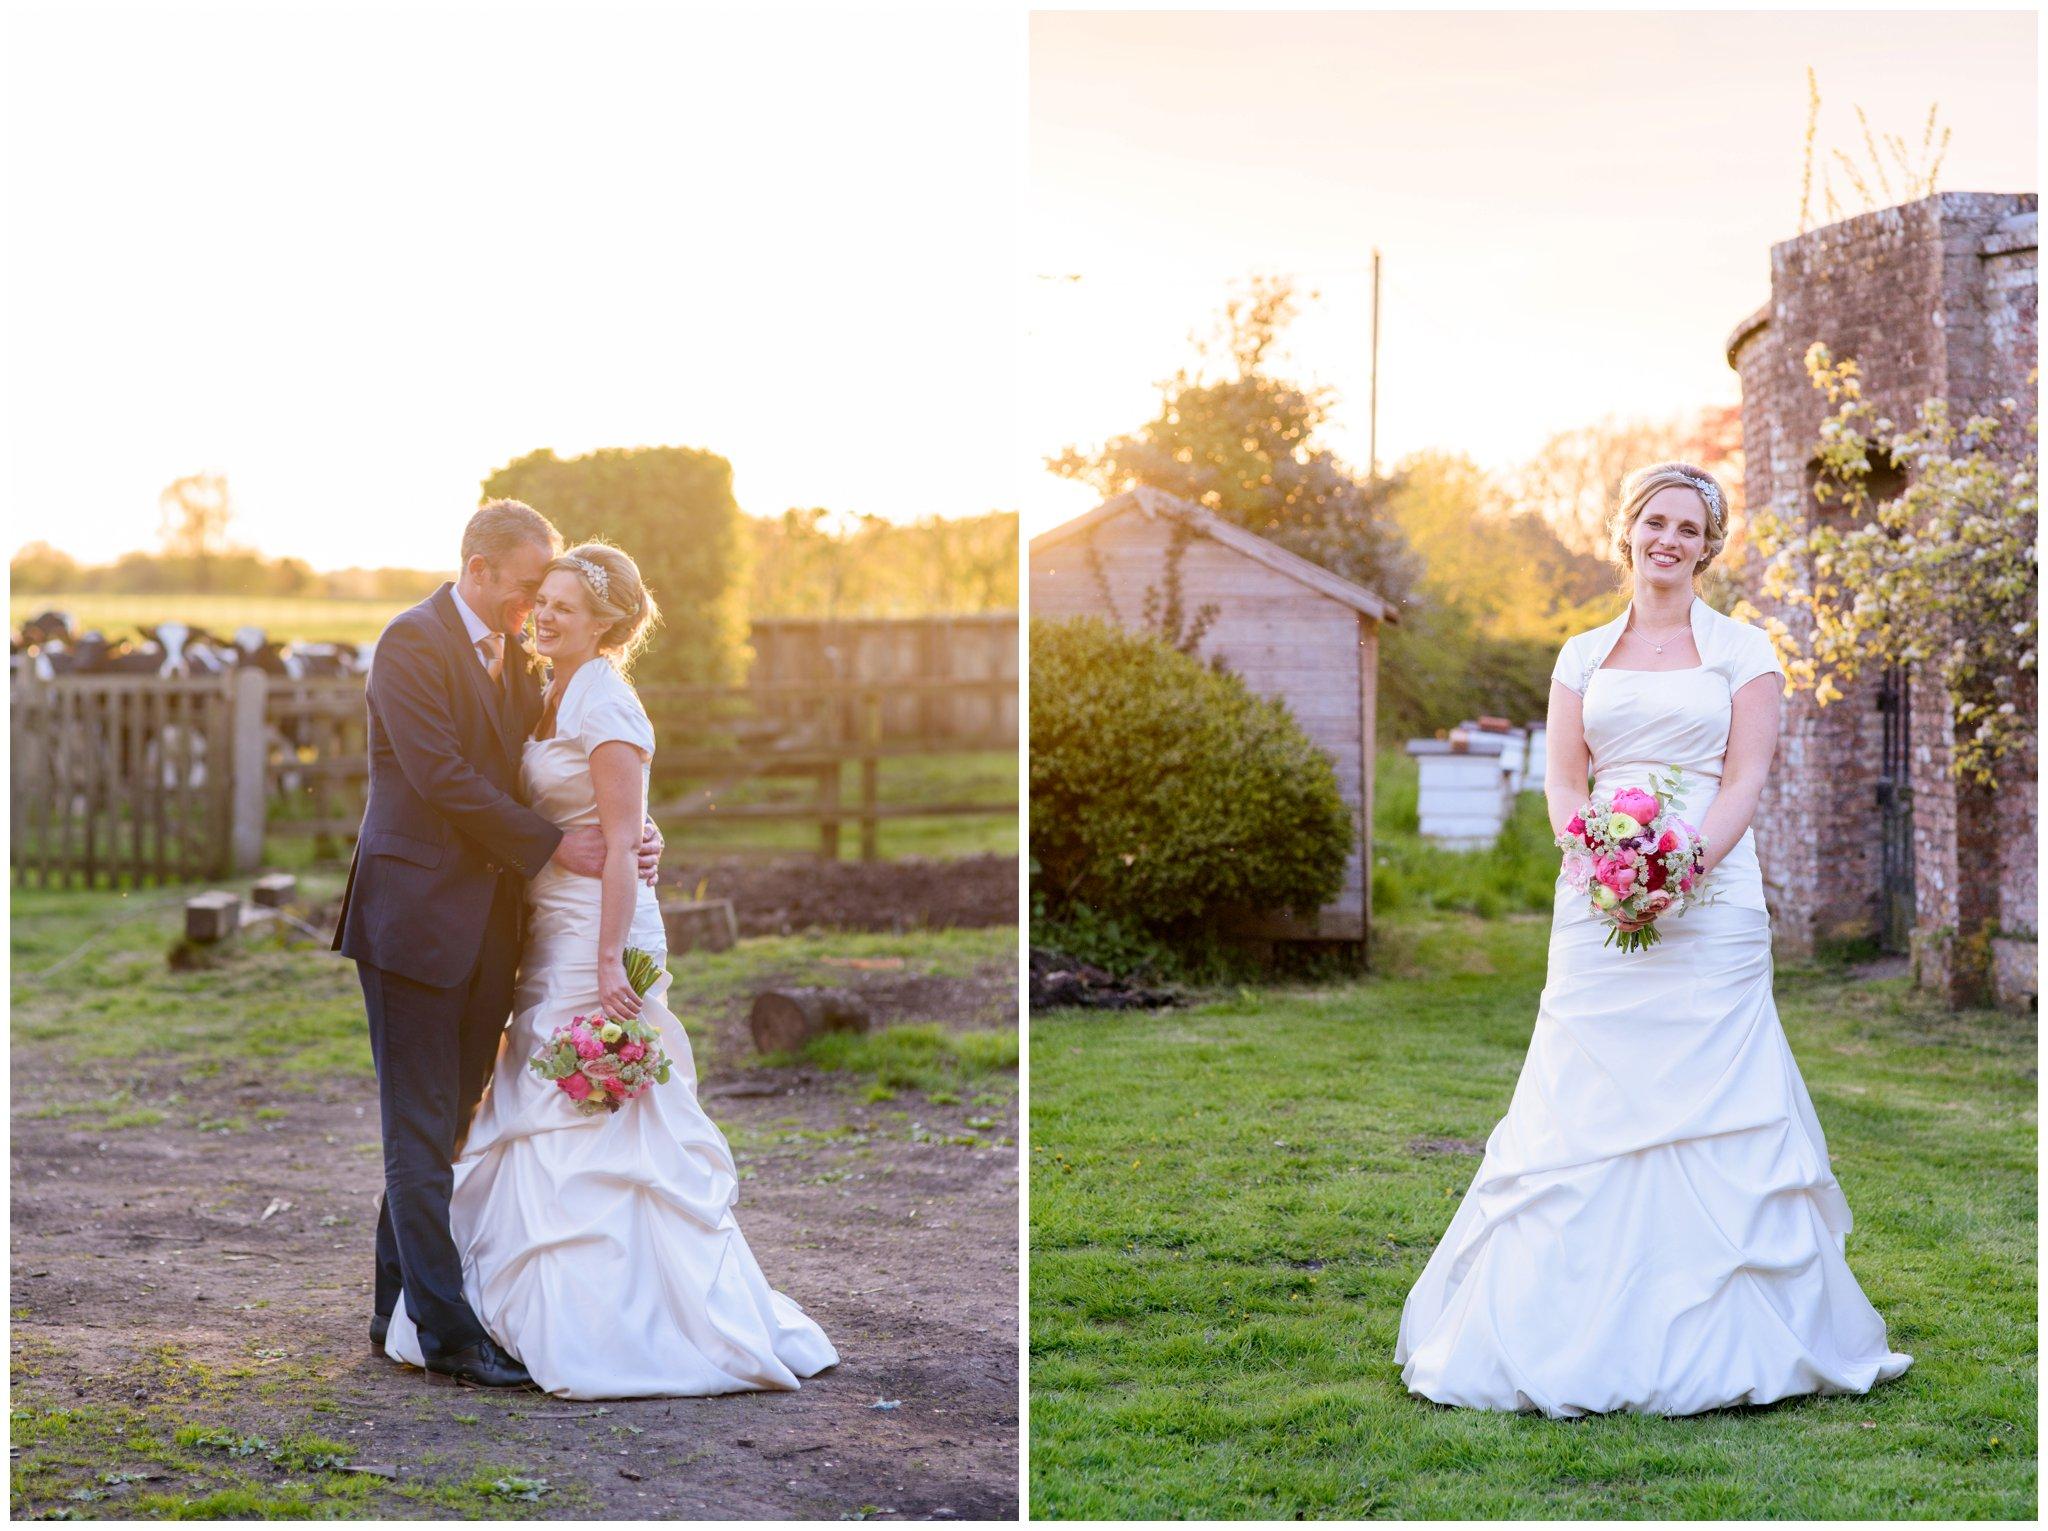 bride and groom deans court wimborne wedding sunset bride and groom